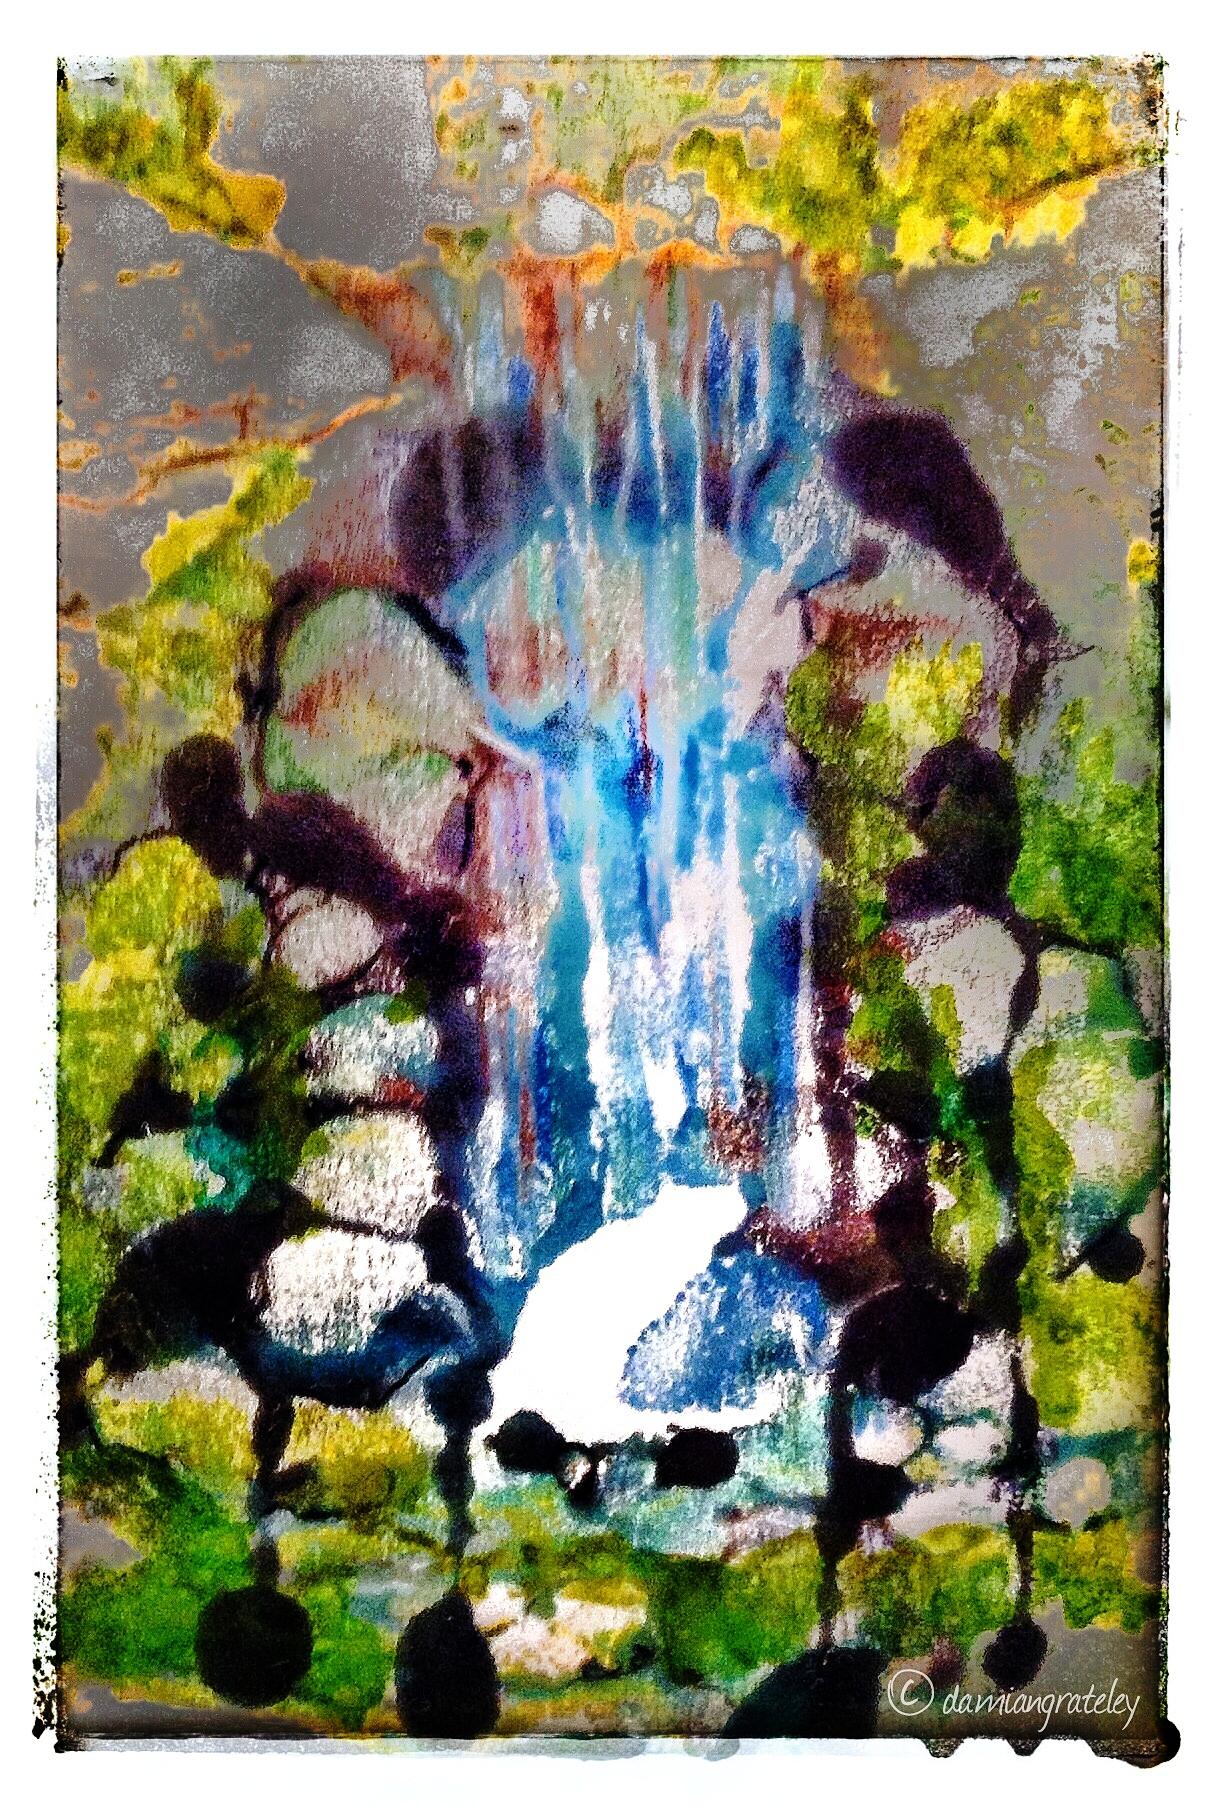 Waterfall (008)